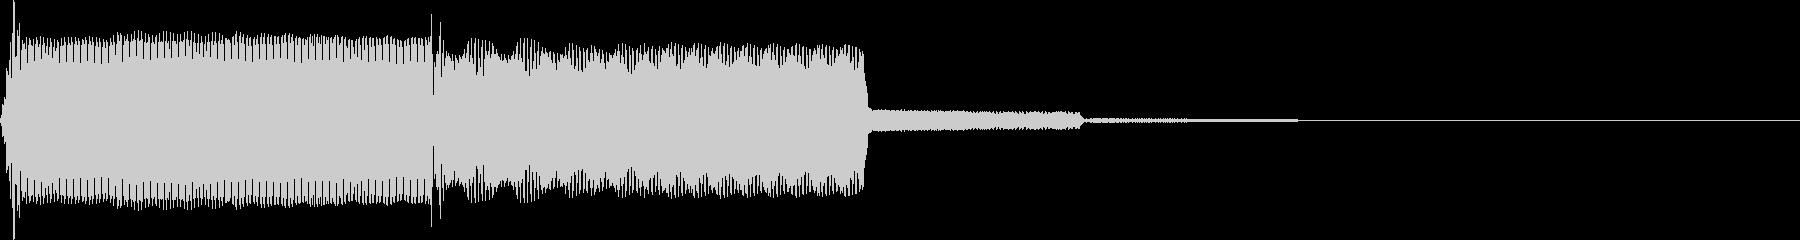 【SE】決定音09(ポピ↑)の未再生の波形